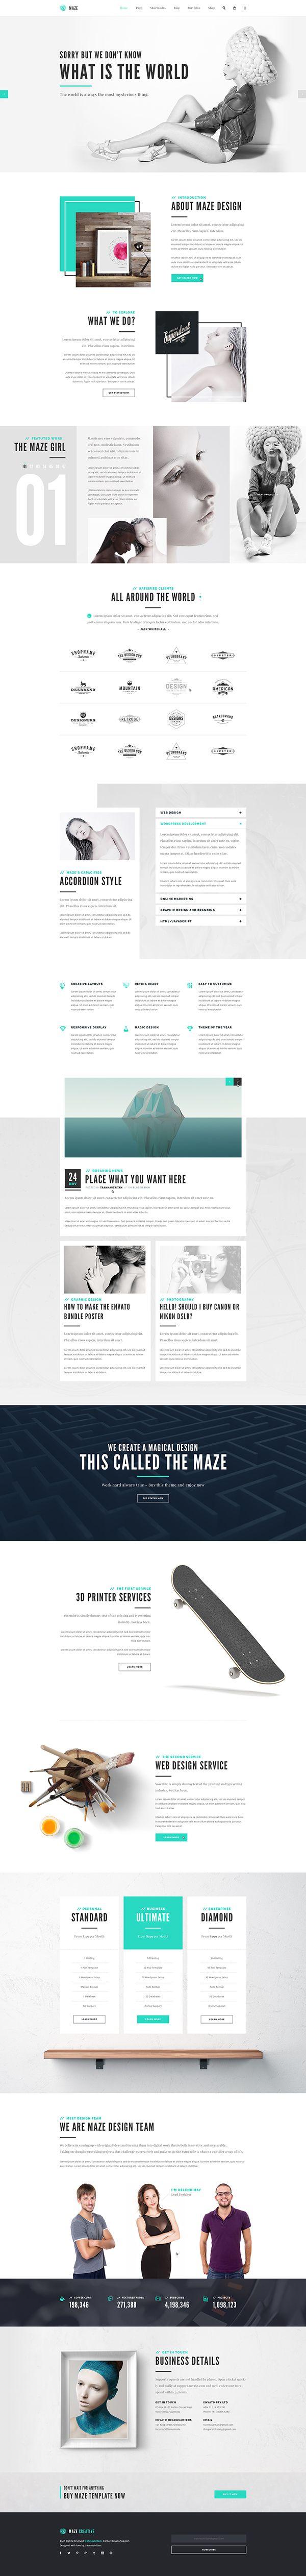 Maze | Creative Agency PSD Template on Behance